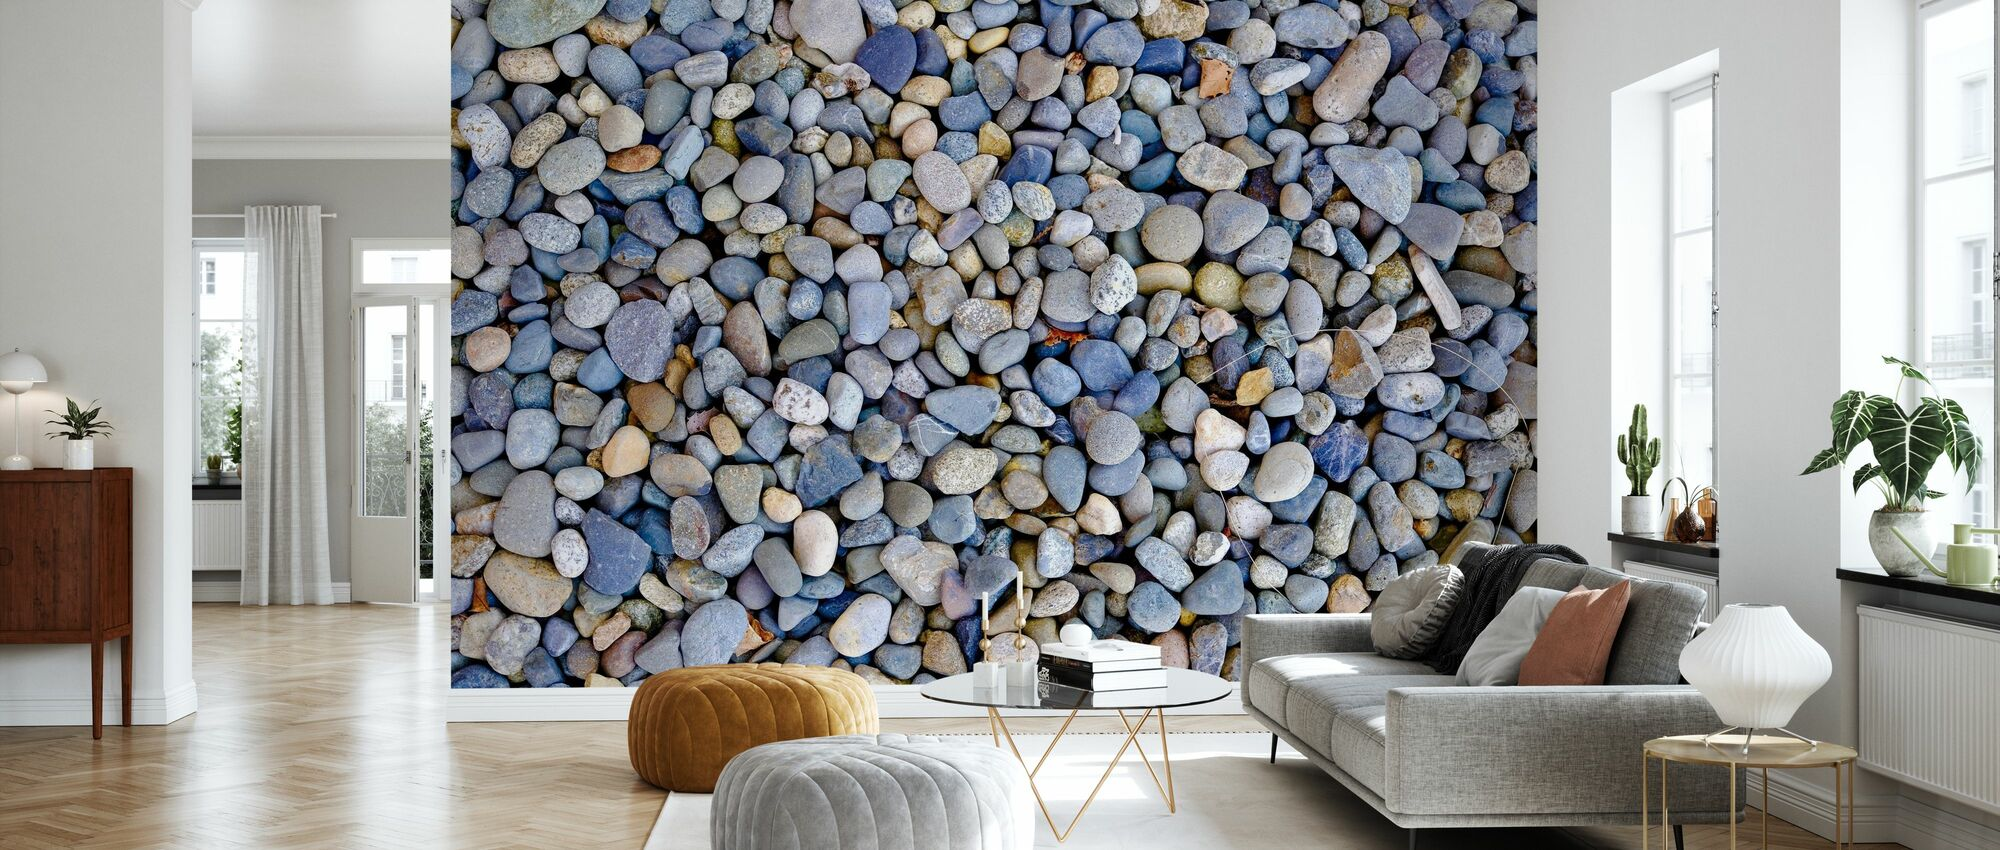 Colorful Pebbles - Wallpaper - Living Room